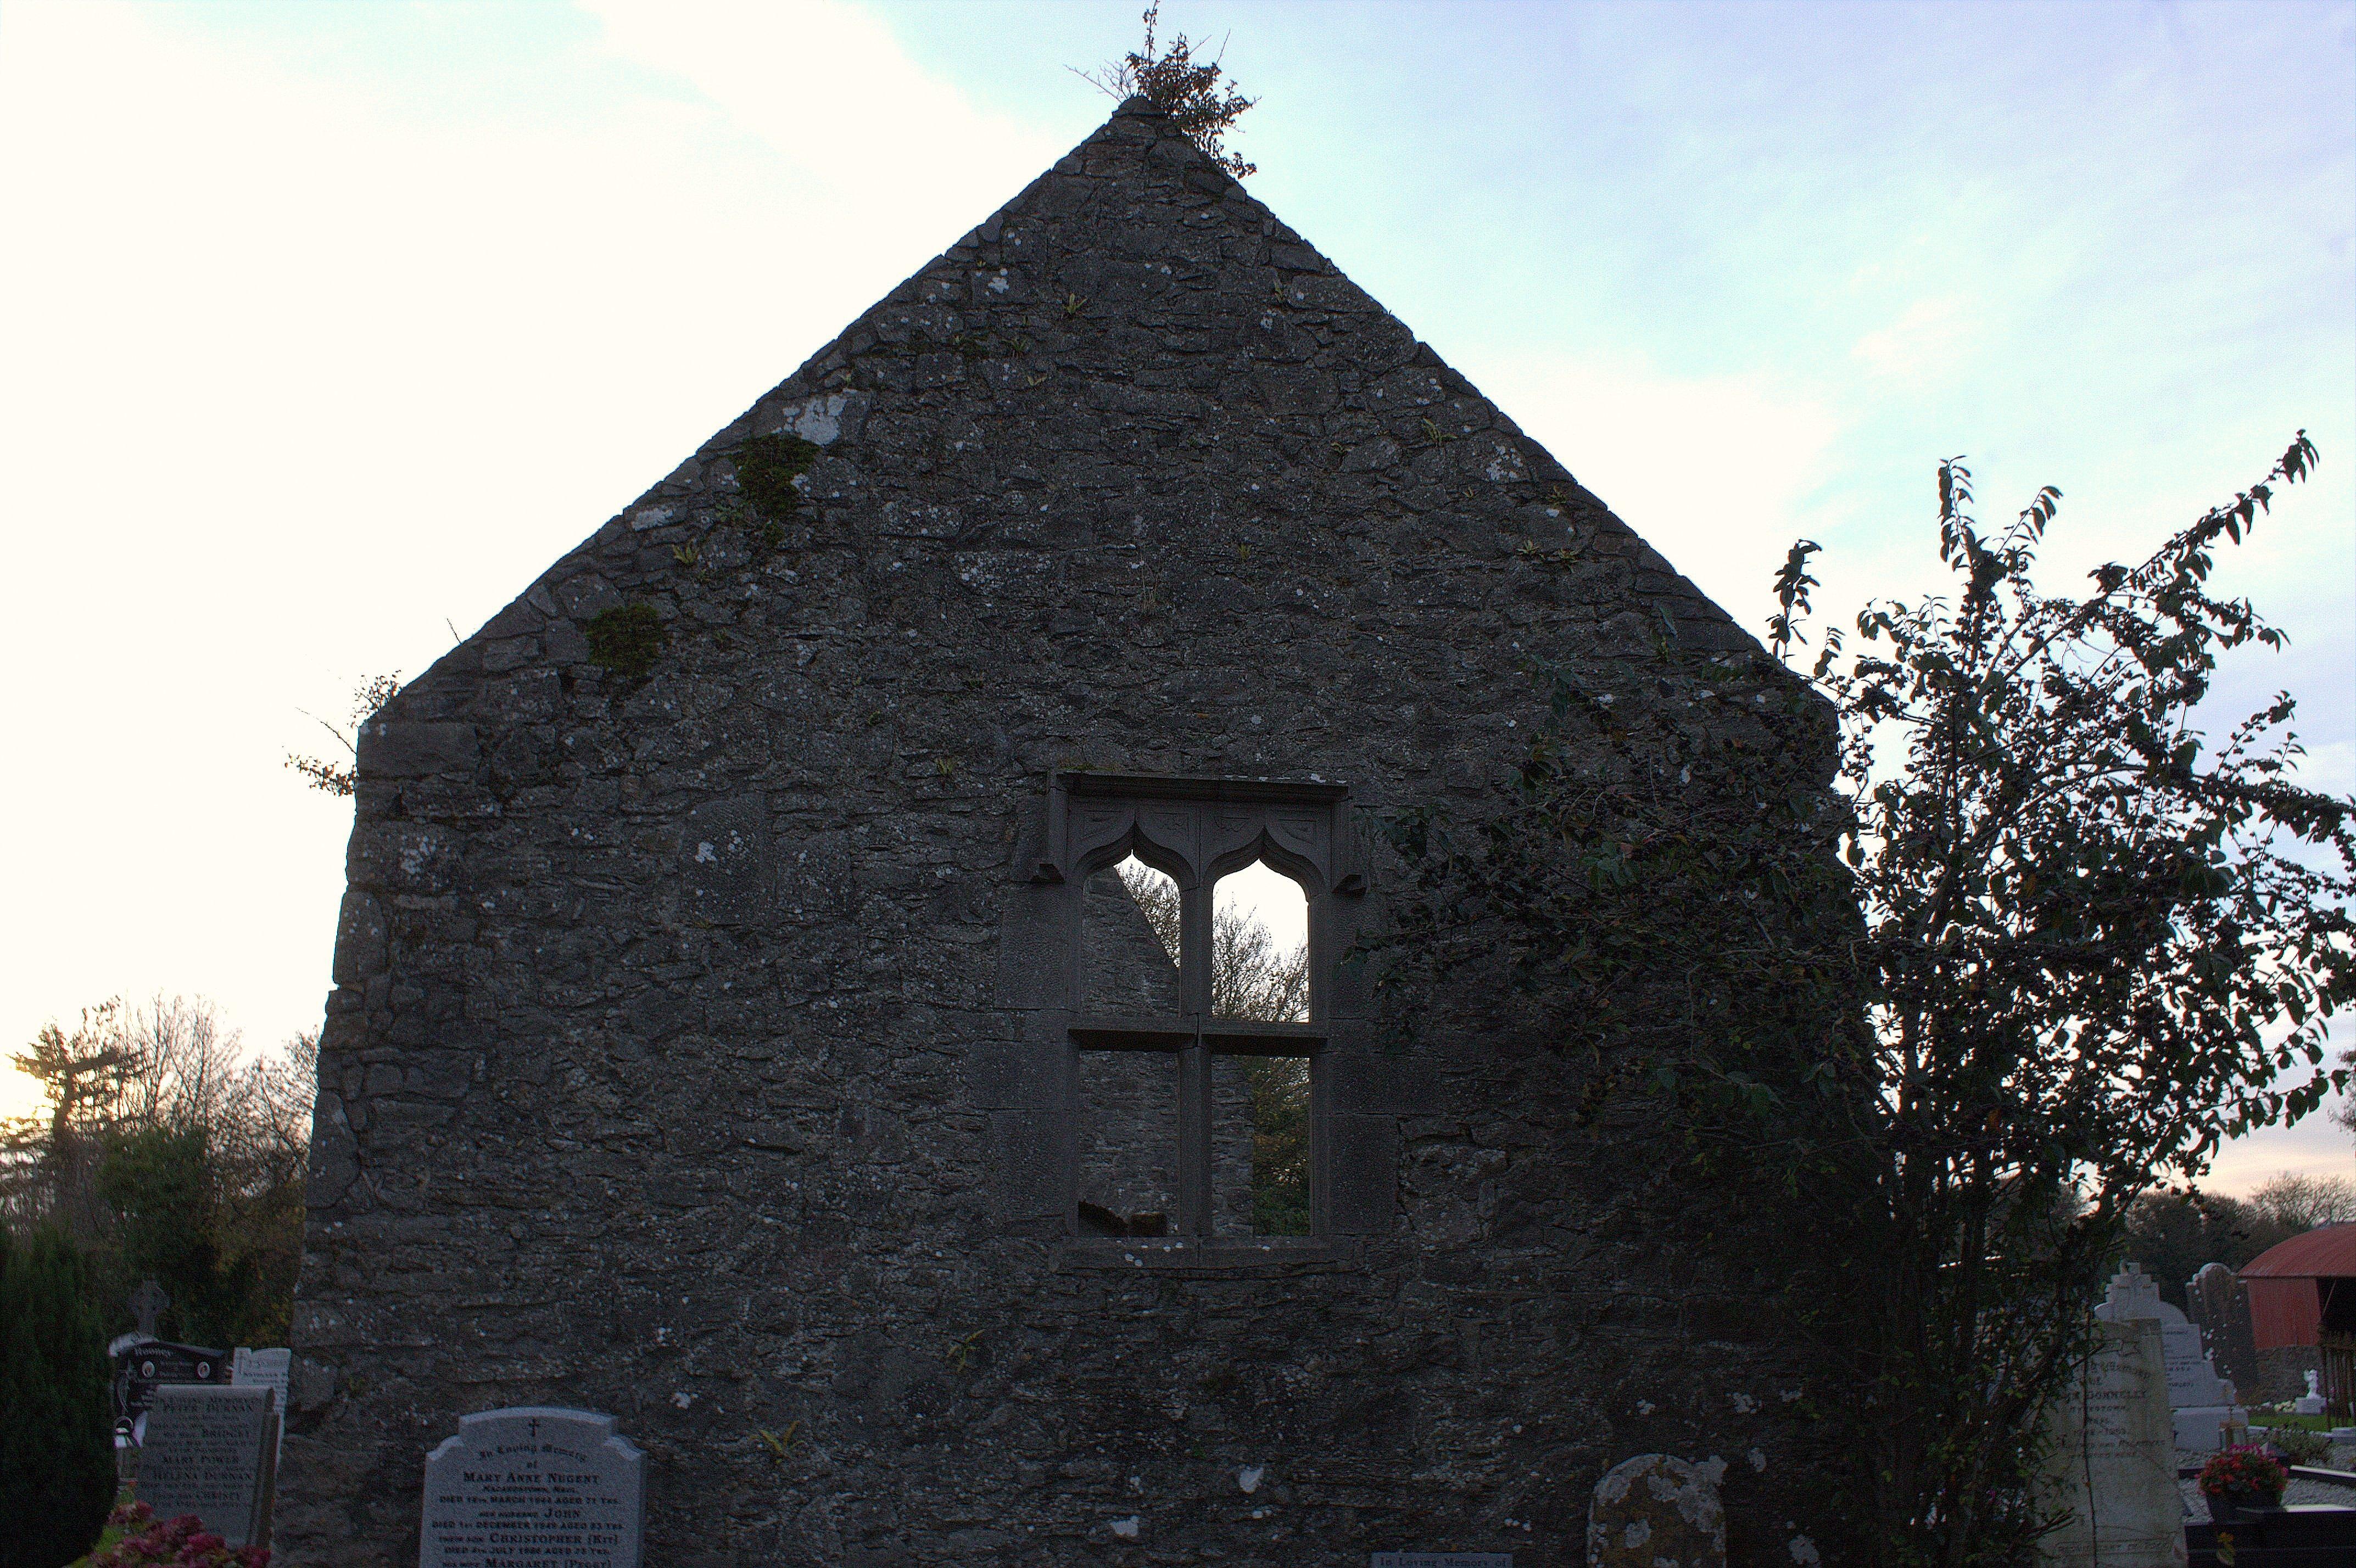 07. Old Naul Parish Church, Dublin, Ireland